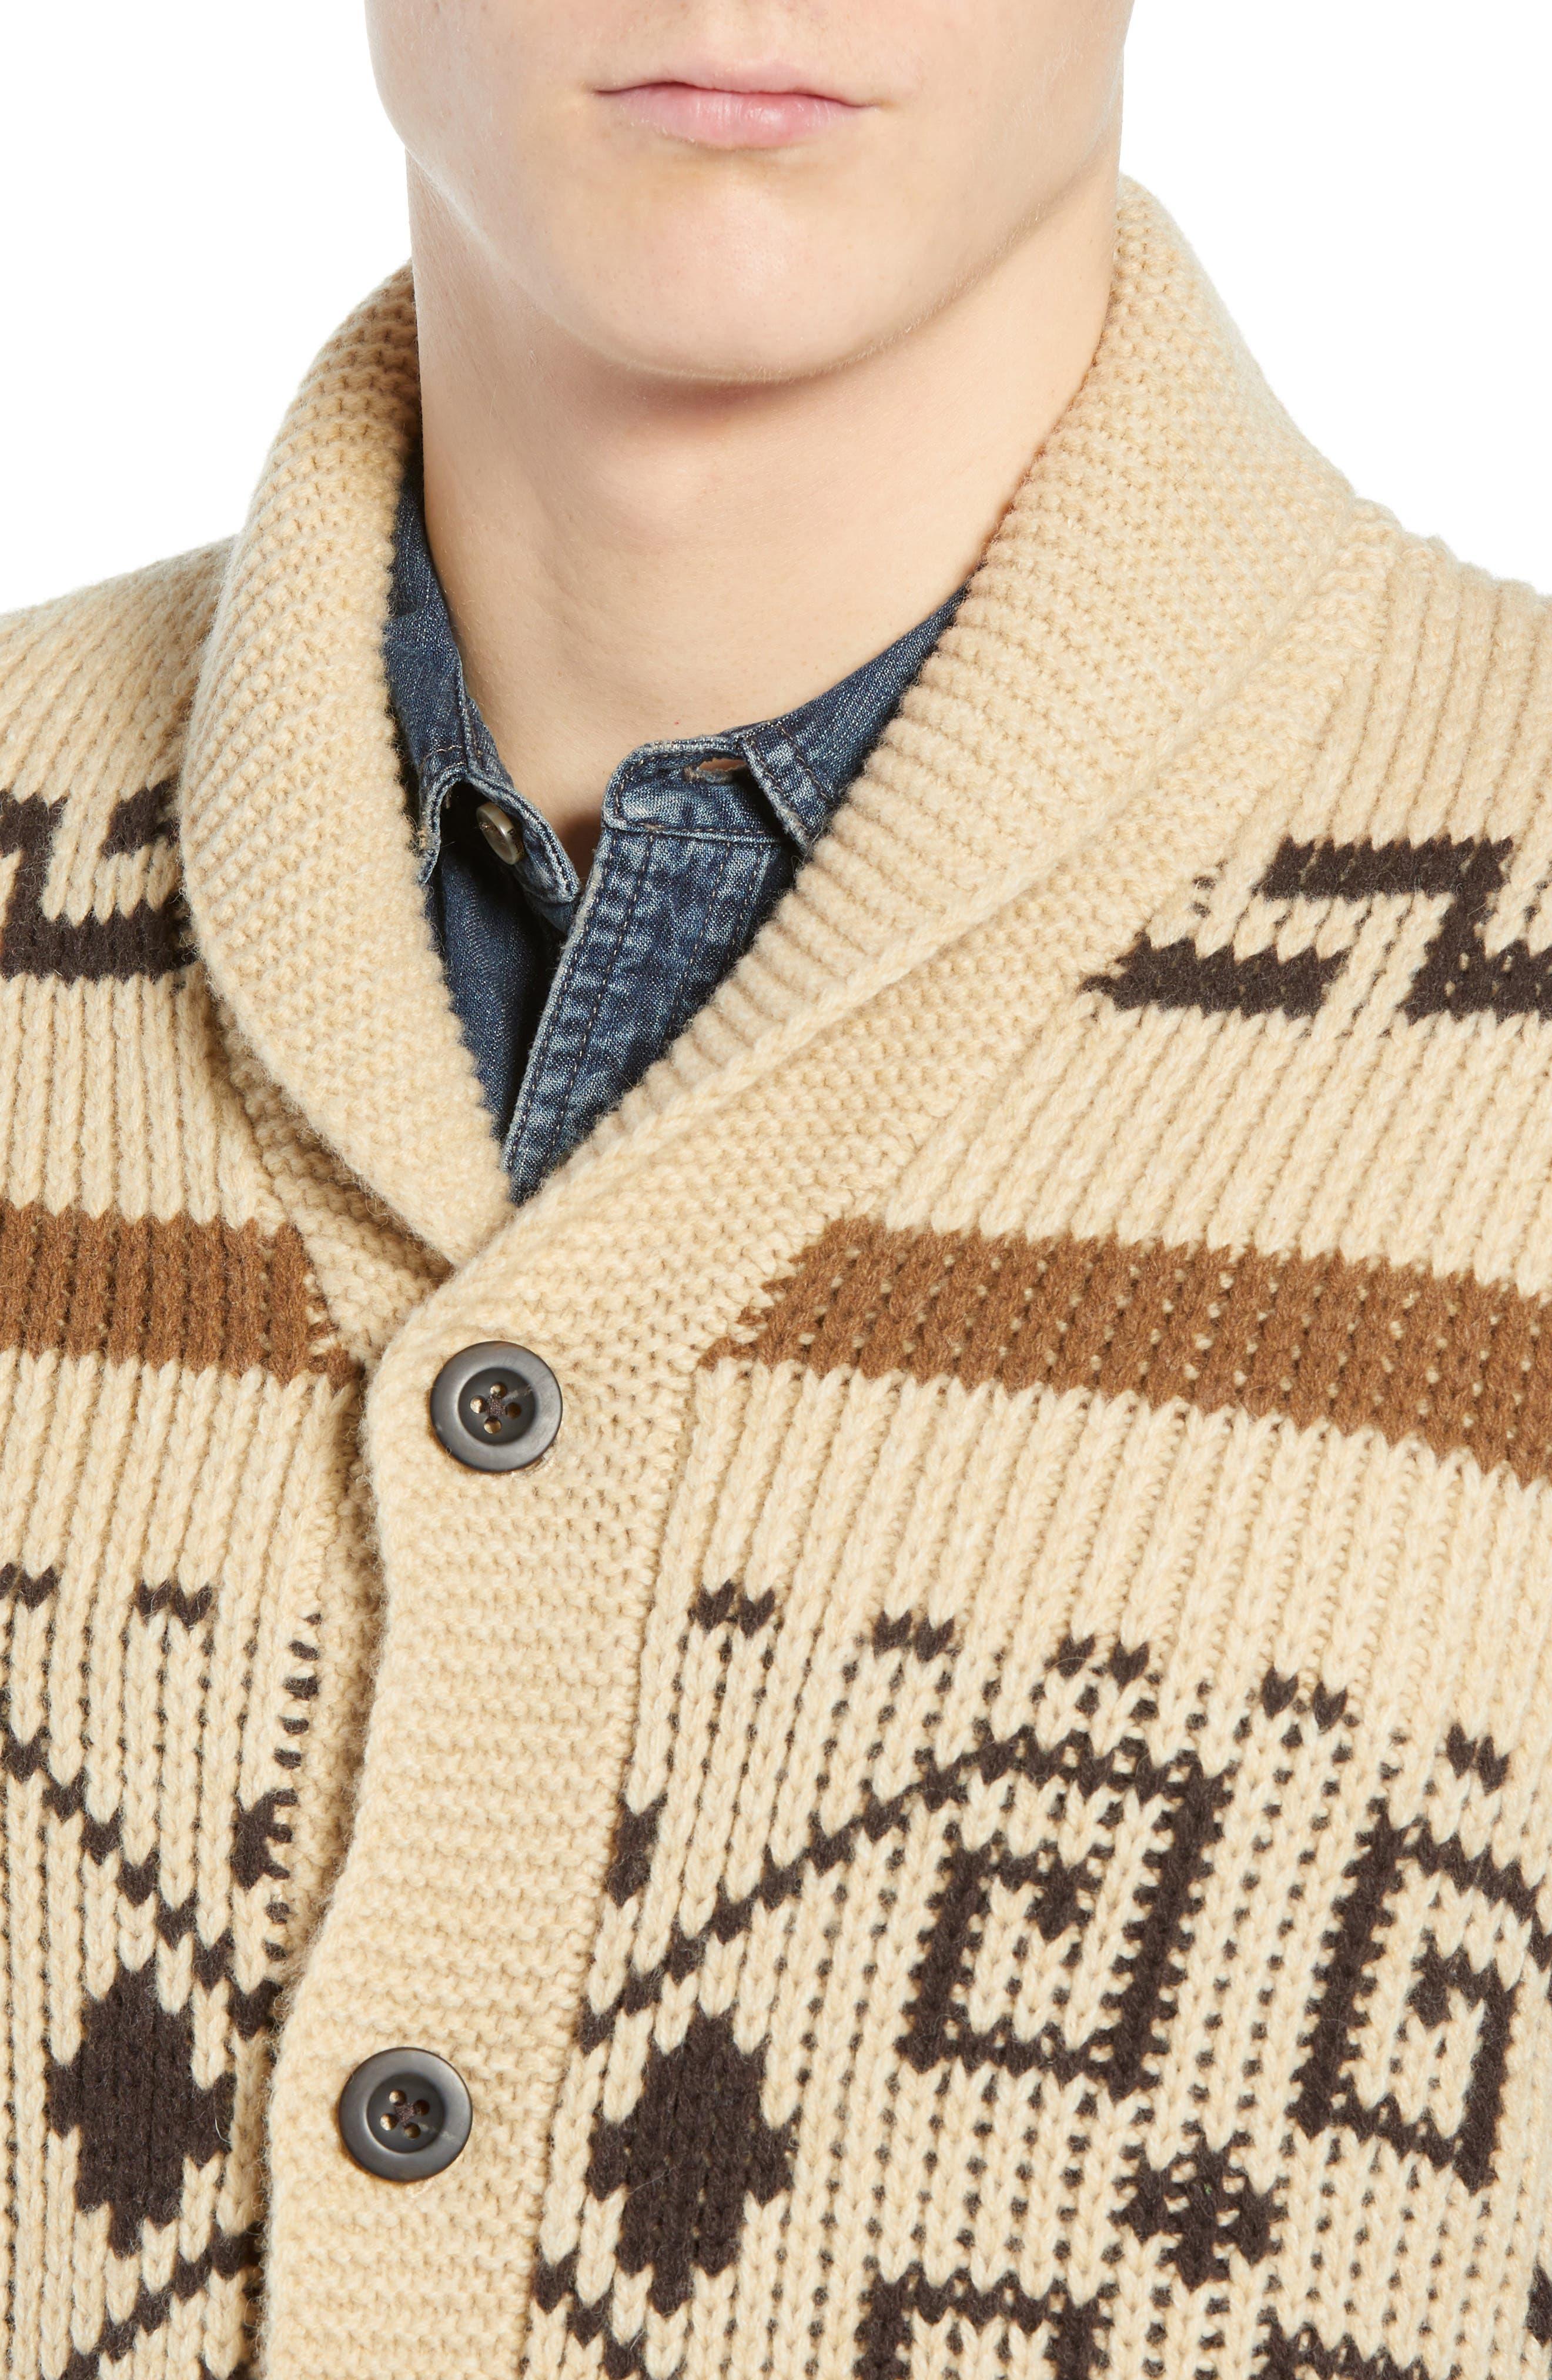 Original Westerley Sweater Vest,                             Alternate thumbnail 4, color,                             TAN/ BROWN